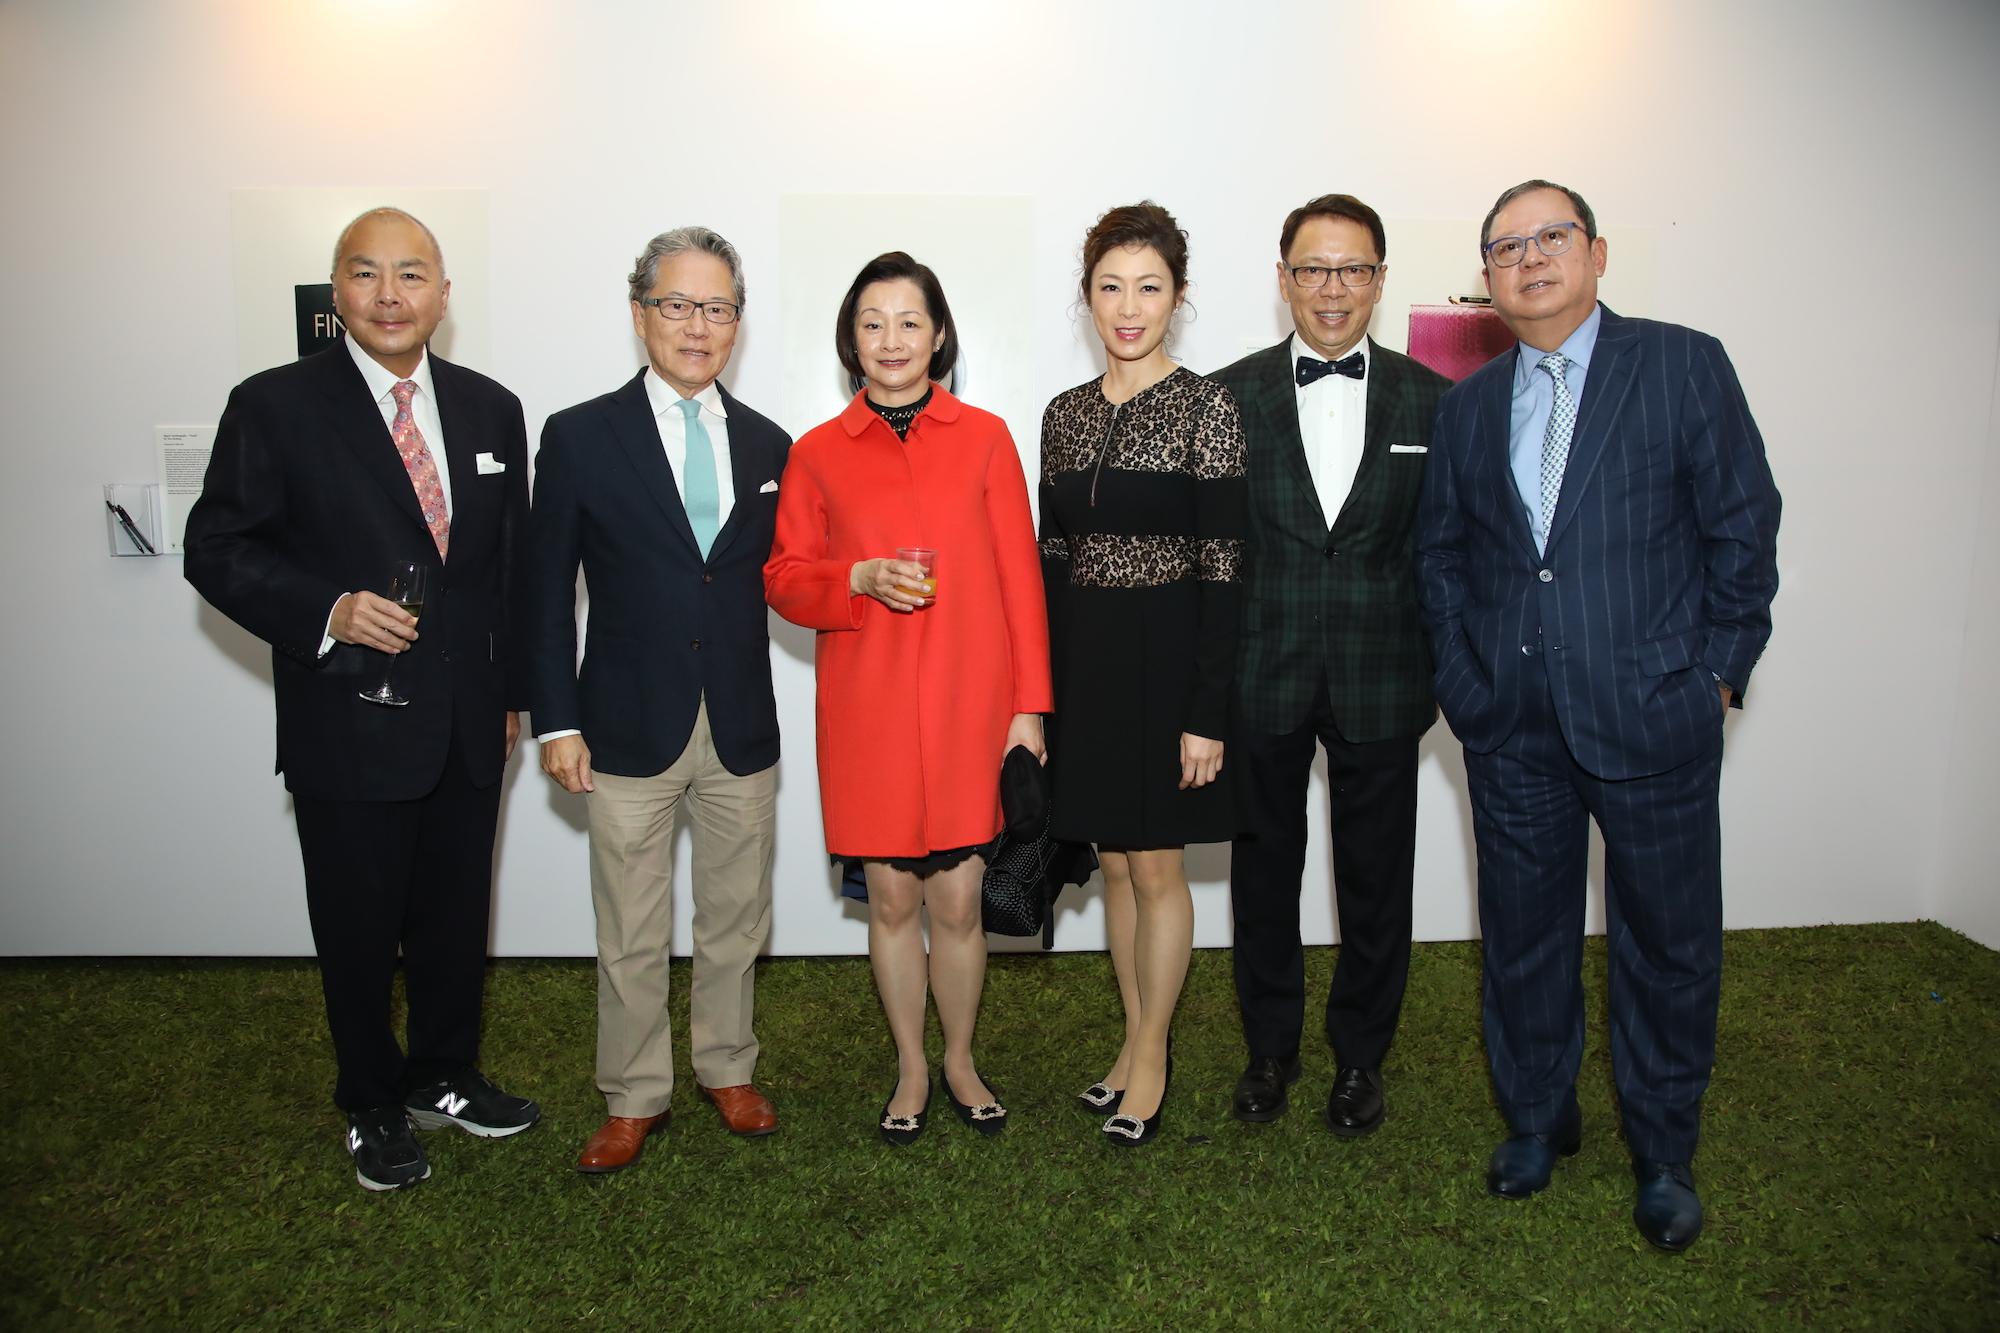 Joseph Fung, Tom Chan, Bonnie Chan, Emily Yeung, Caleb Chan, Peter Lam